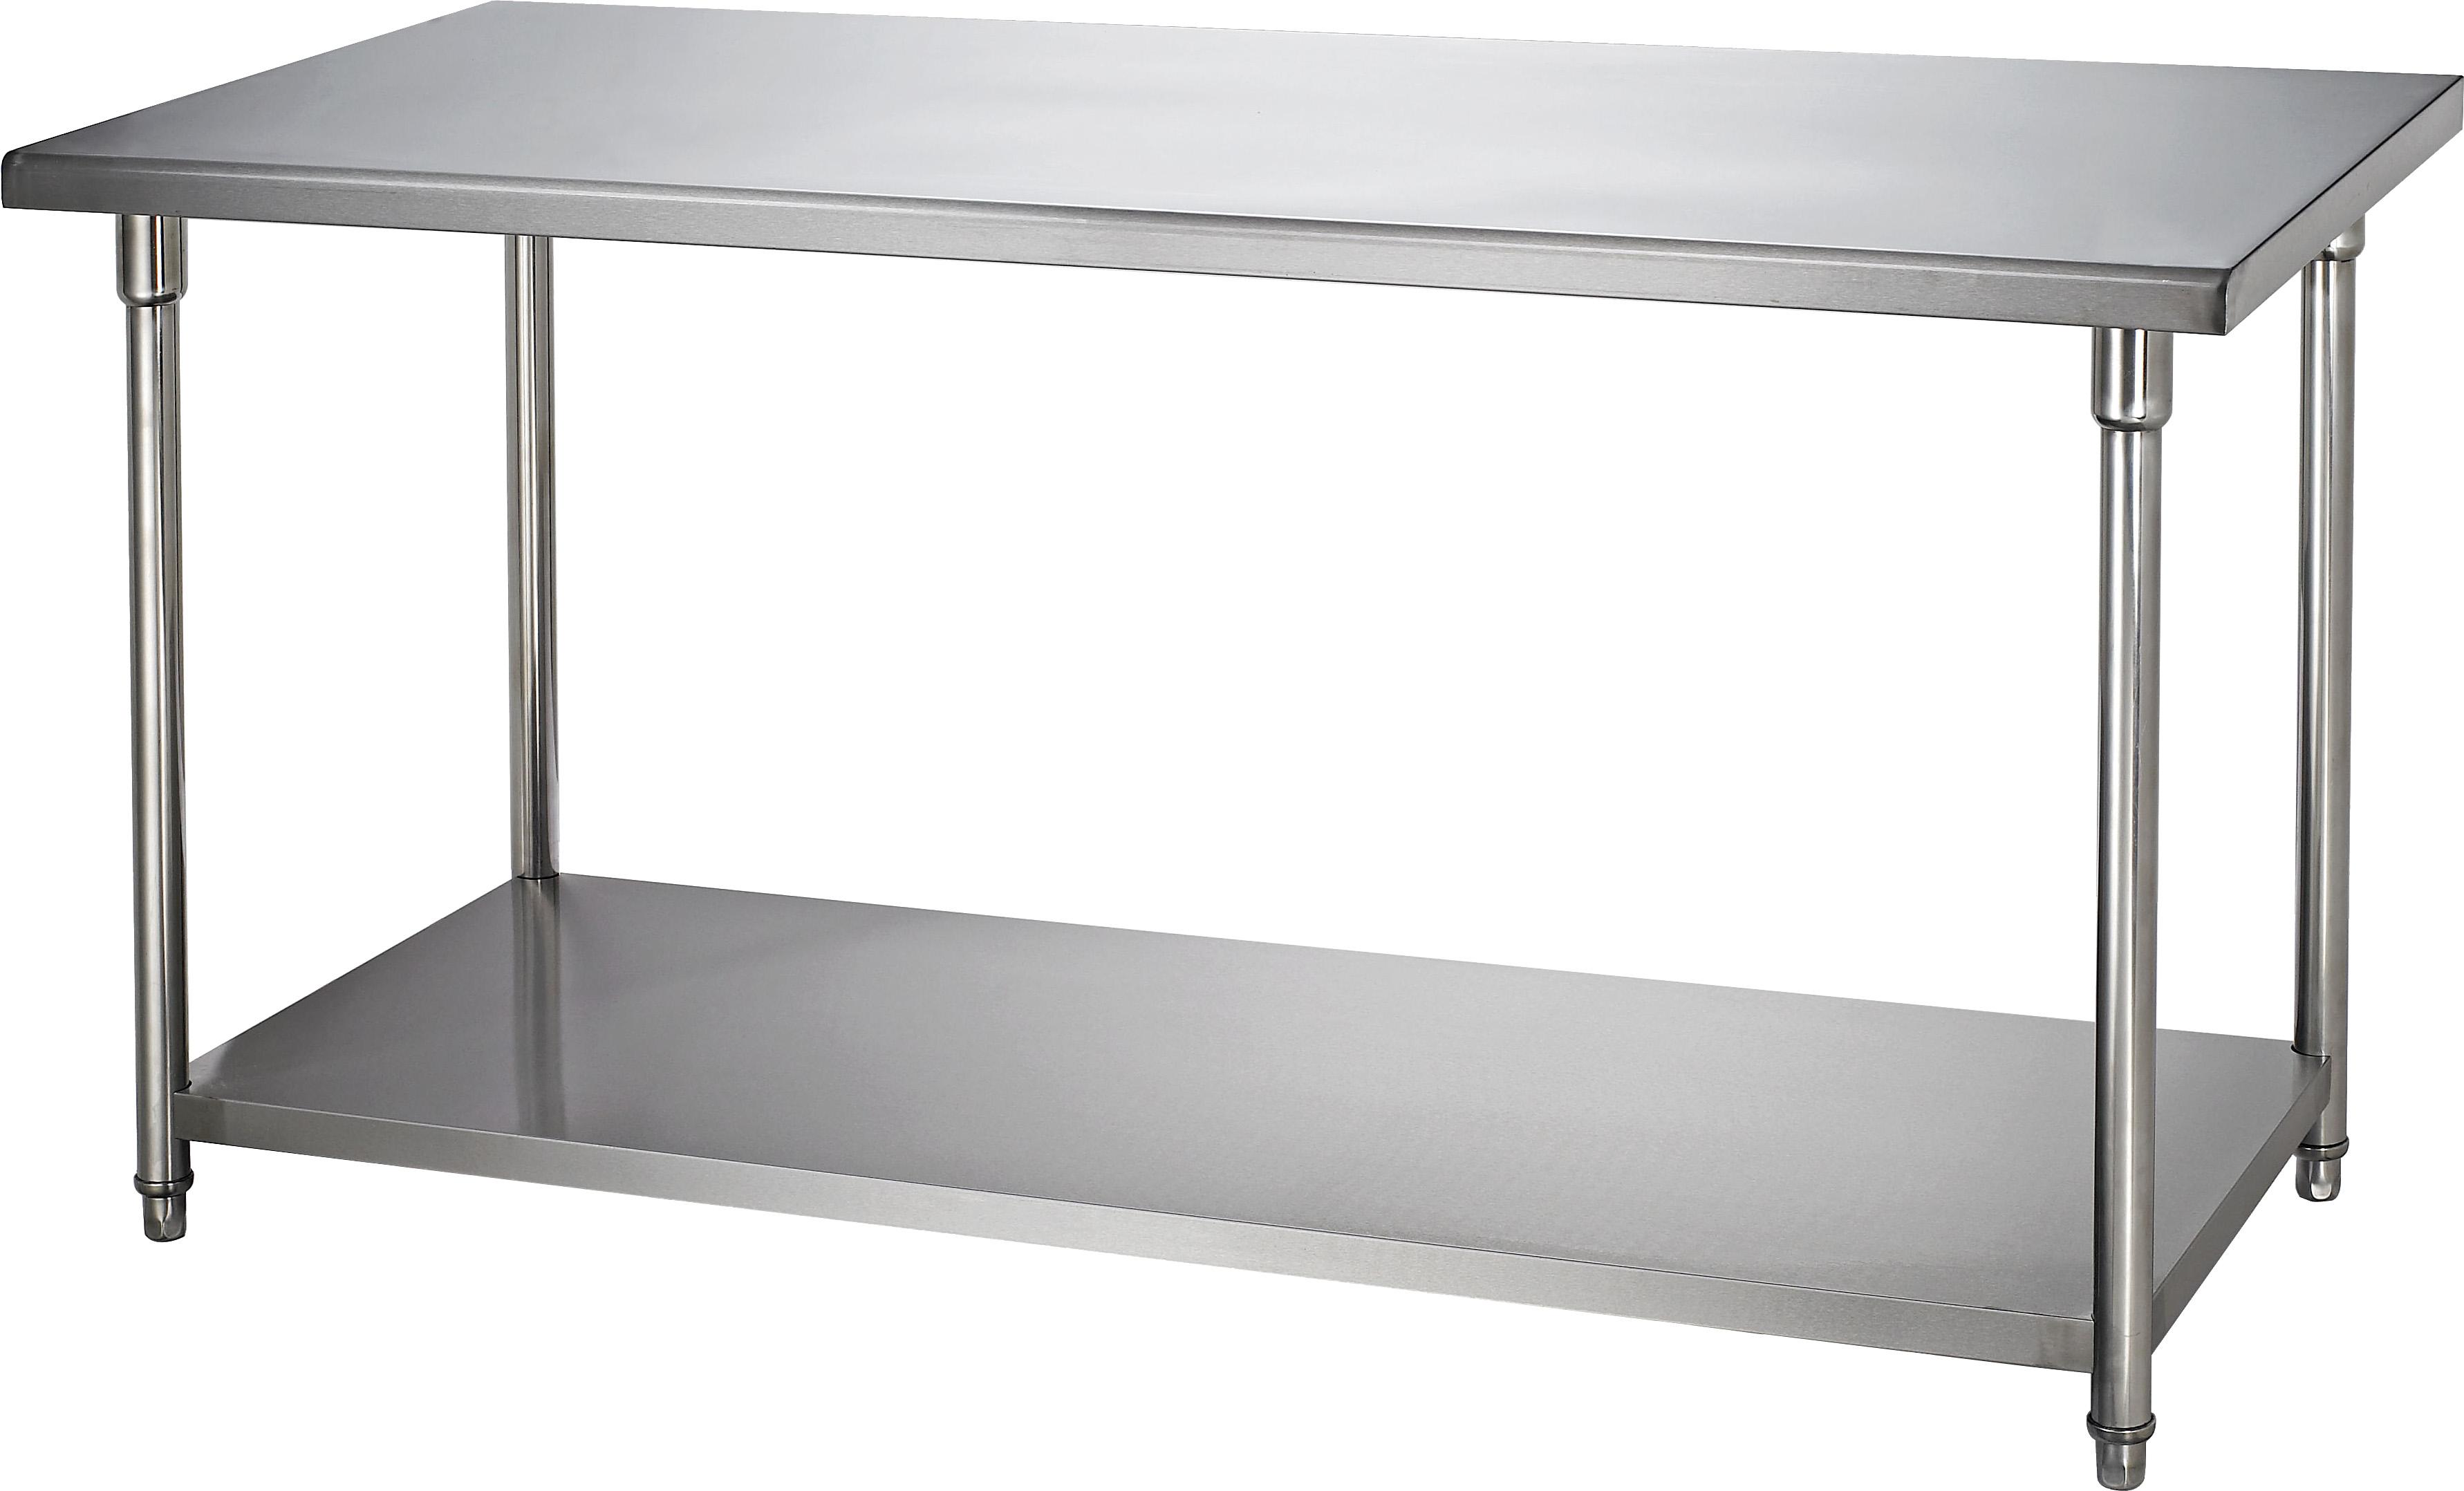 Montované pracovné stoly